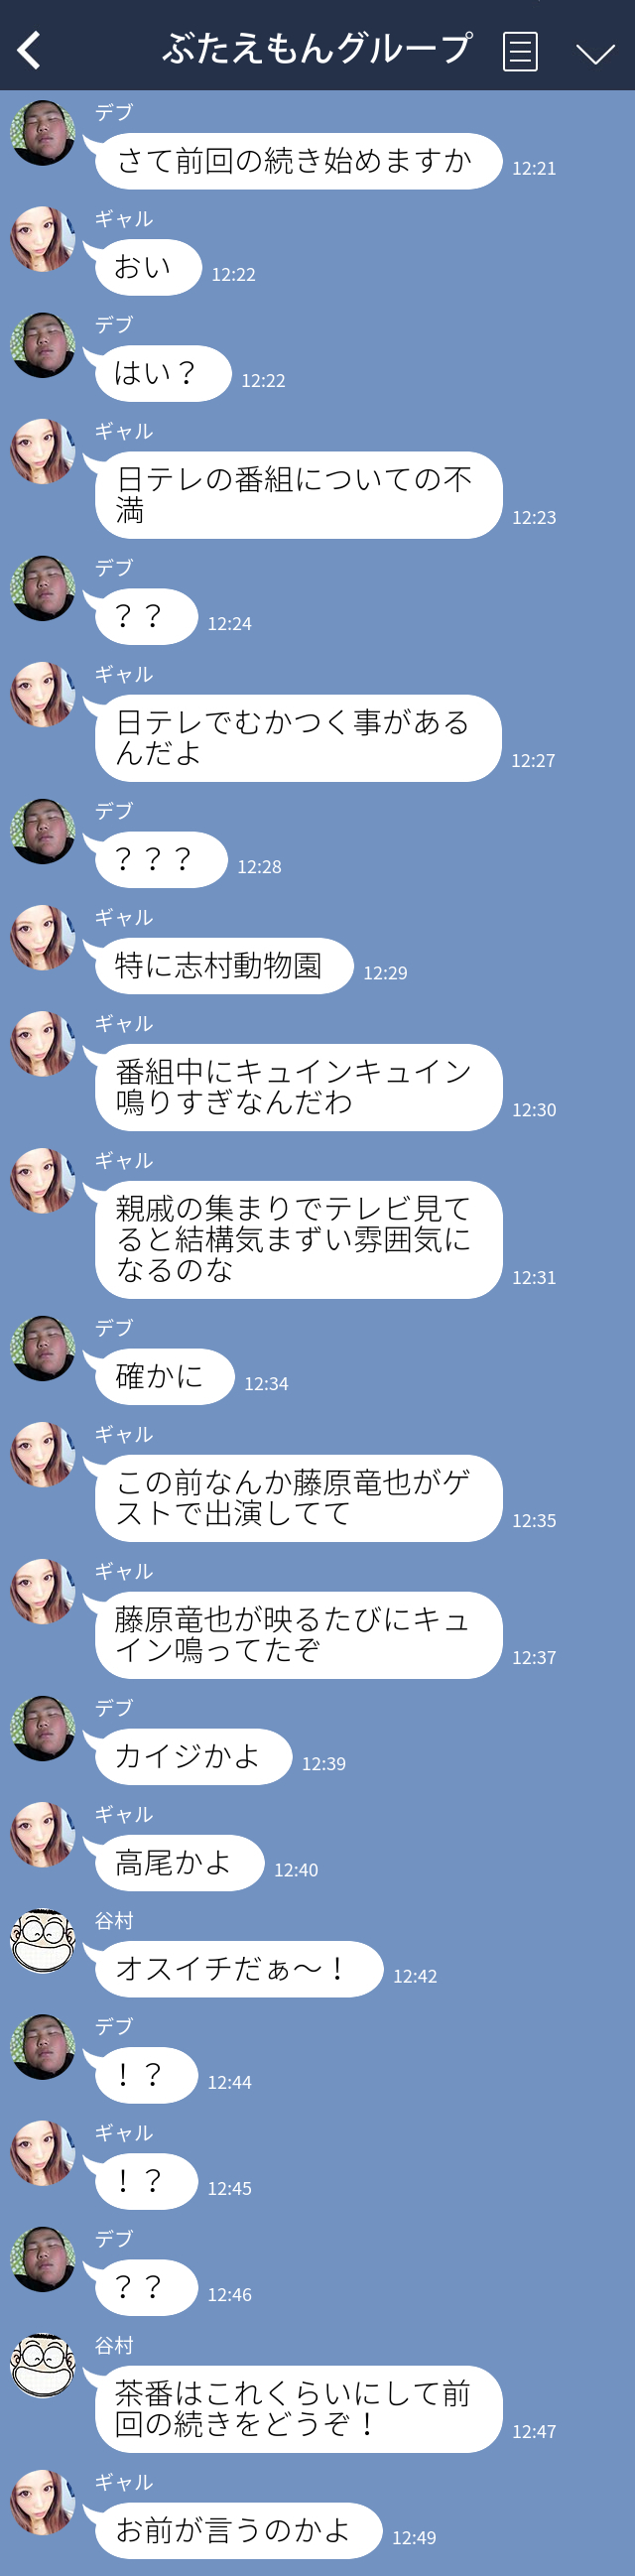 3IyqyRCs.jpg